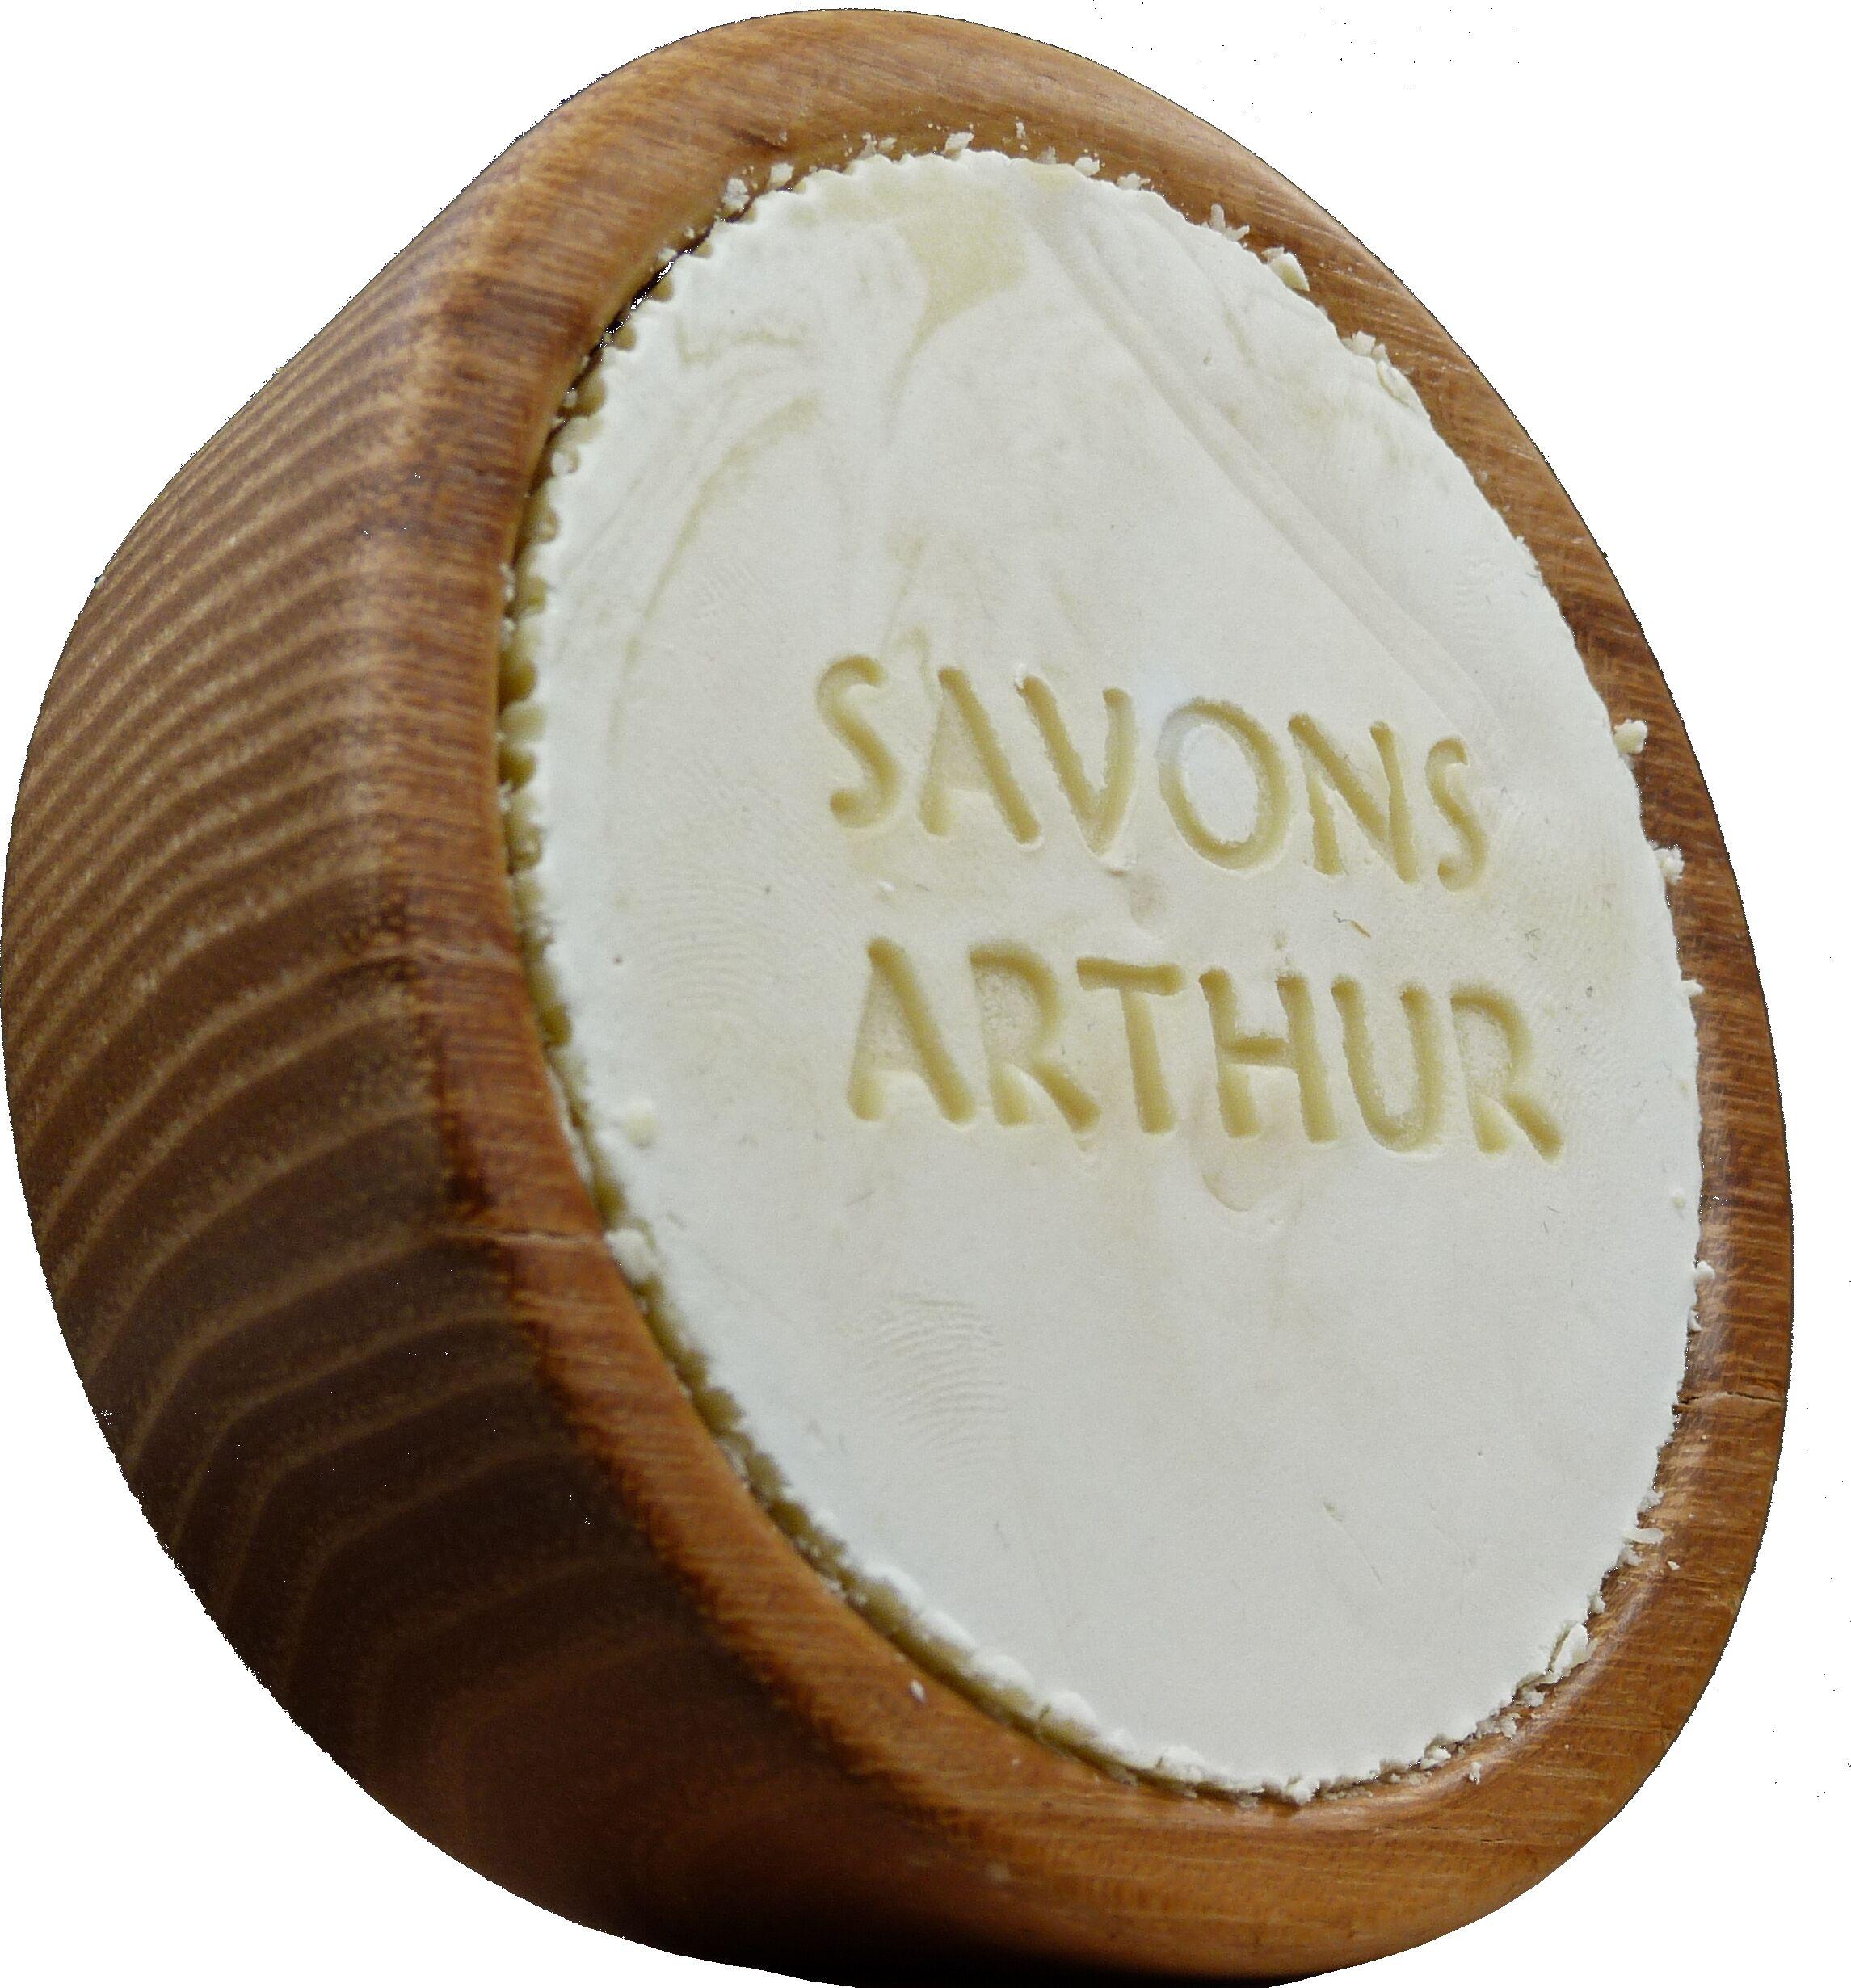 Savons Arthur Savon ARTHUR à barbe Bio et son bol en bois d'acacia